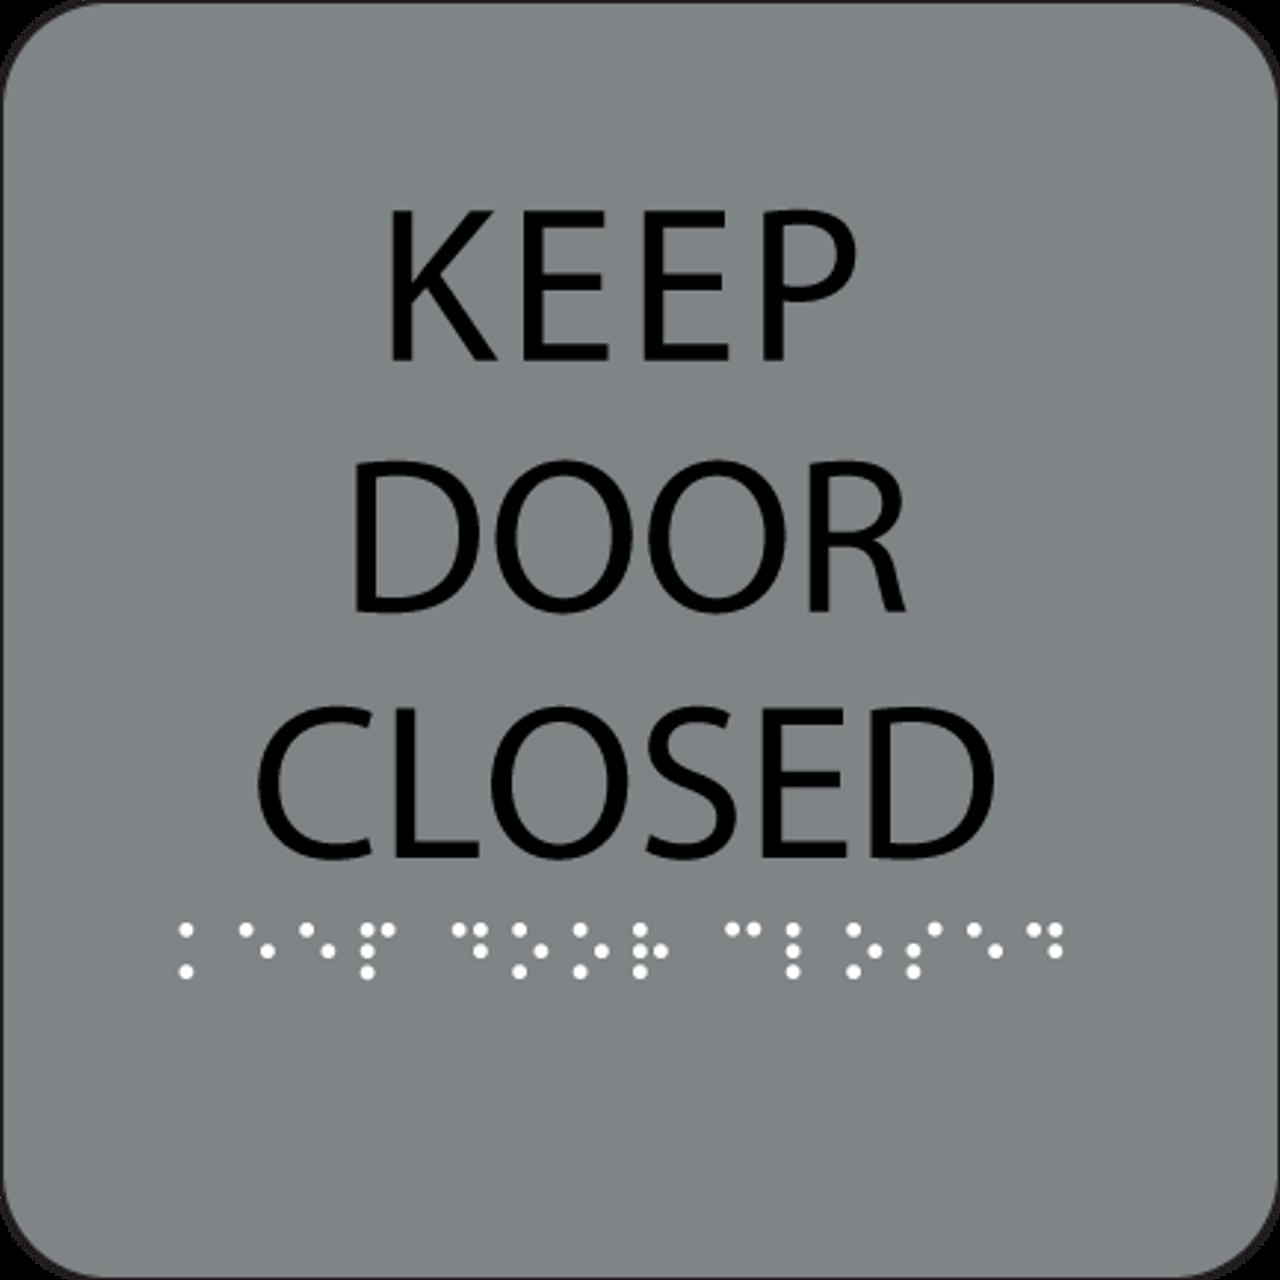 Grey Keep Door Closed Braille Sign